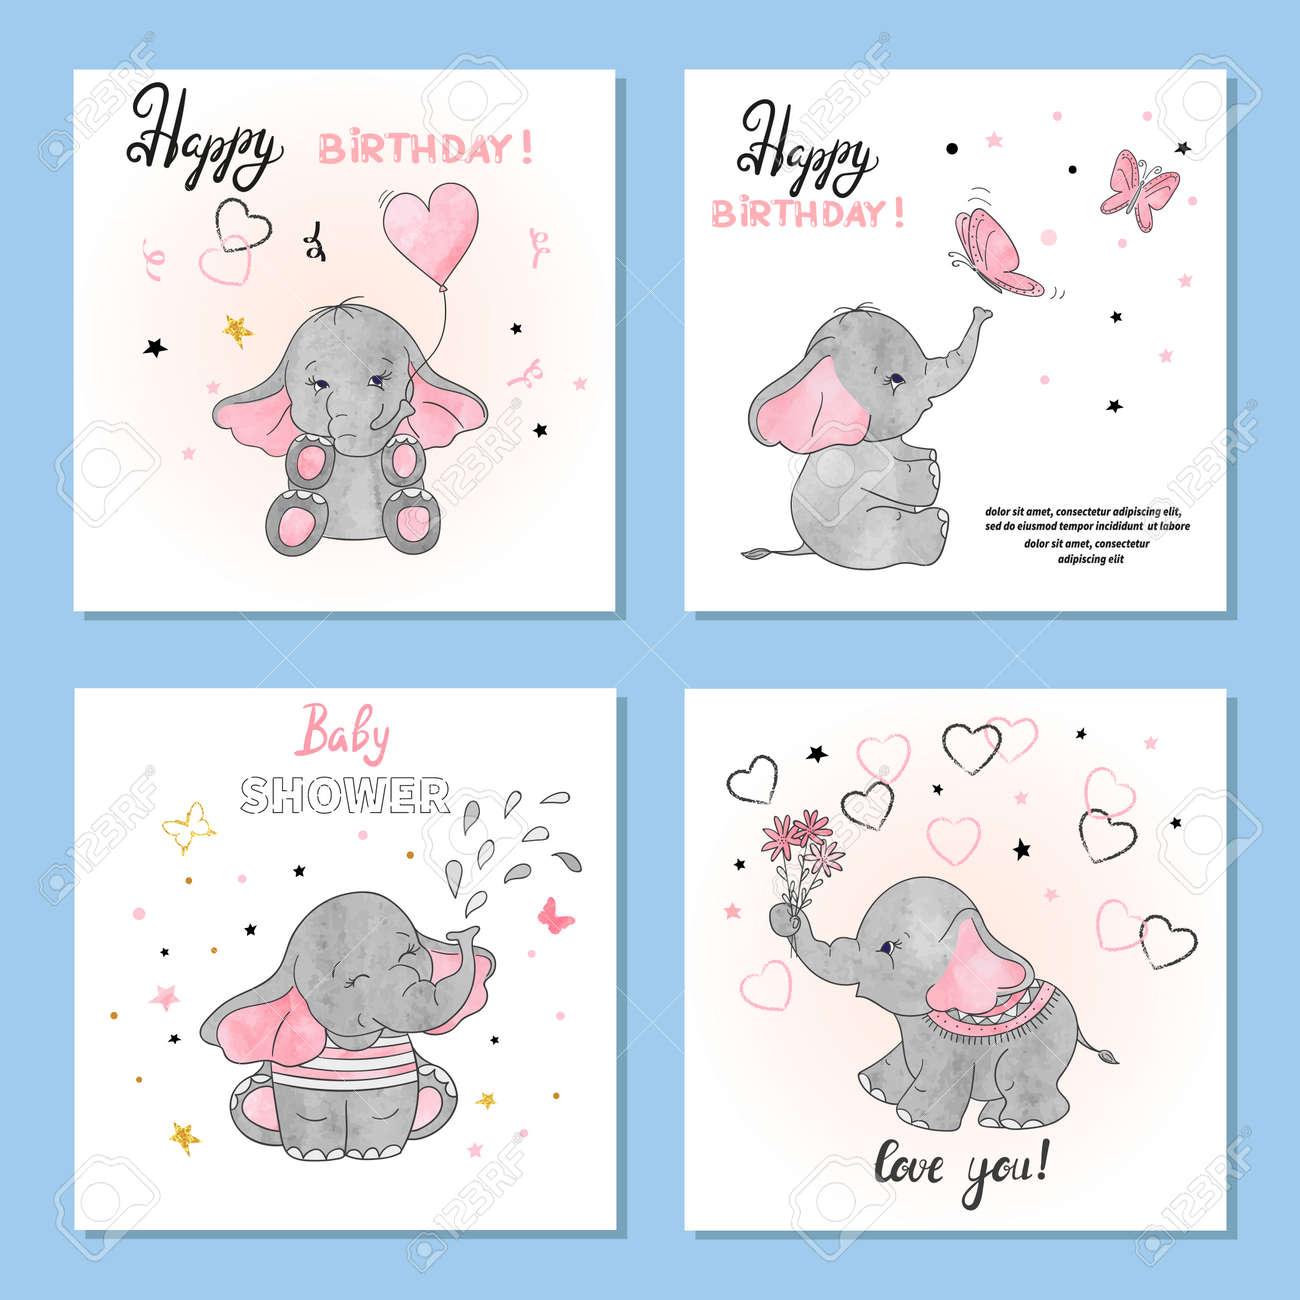 Cute Elephants Vector Illustrations Set Of Birthday Greeting